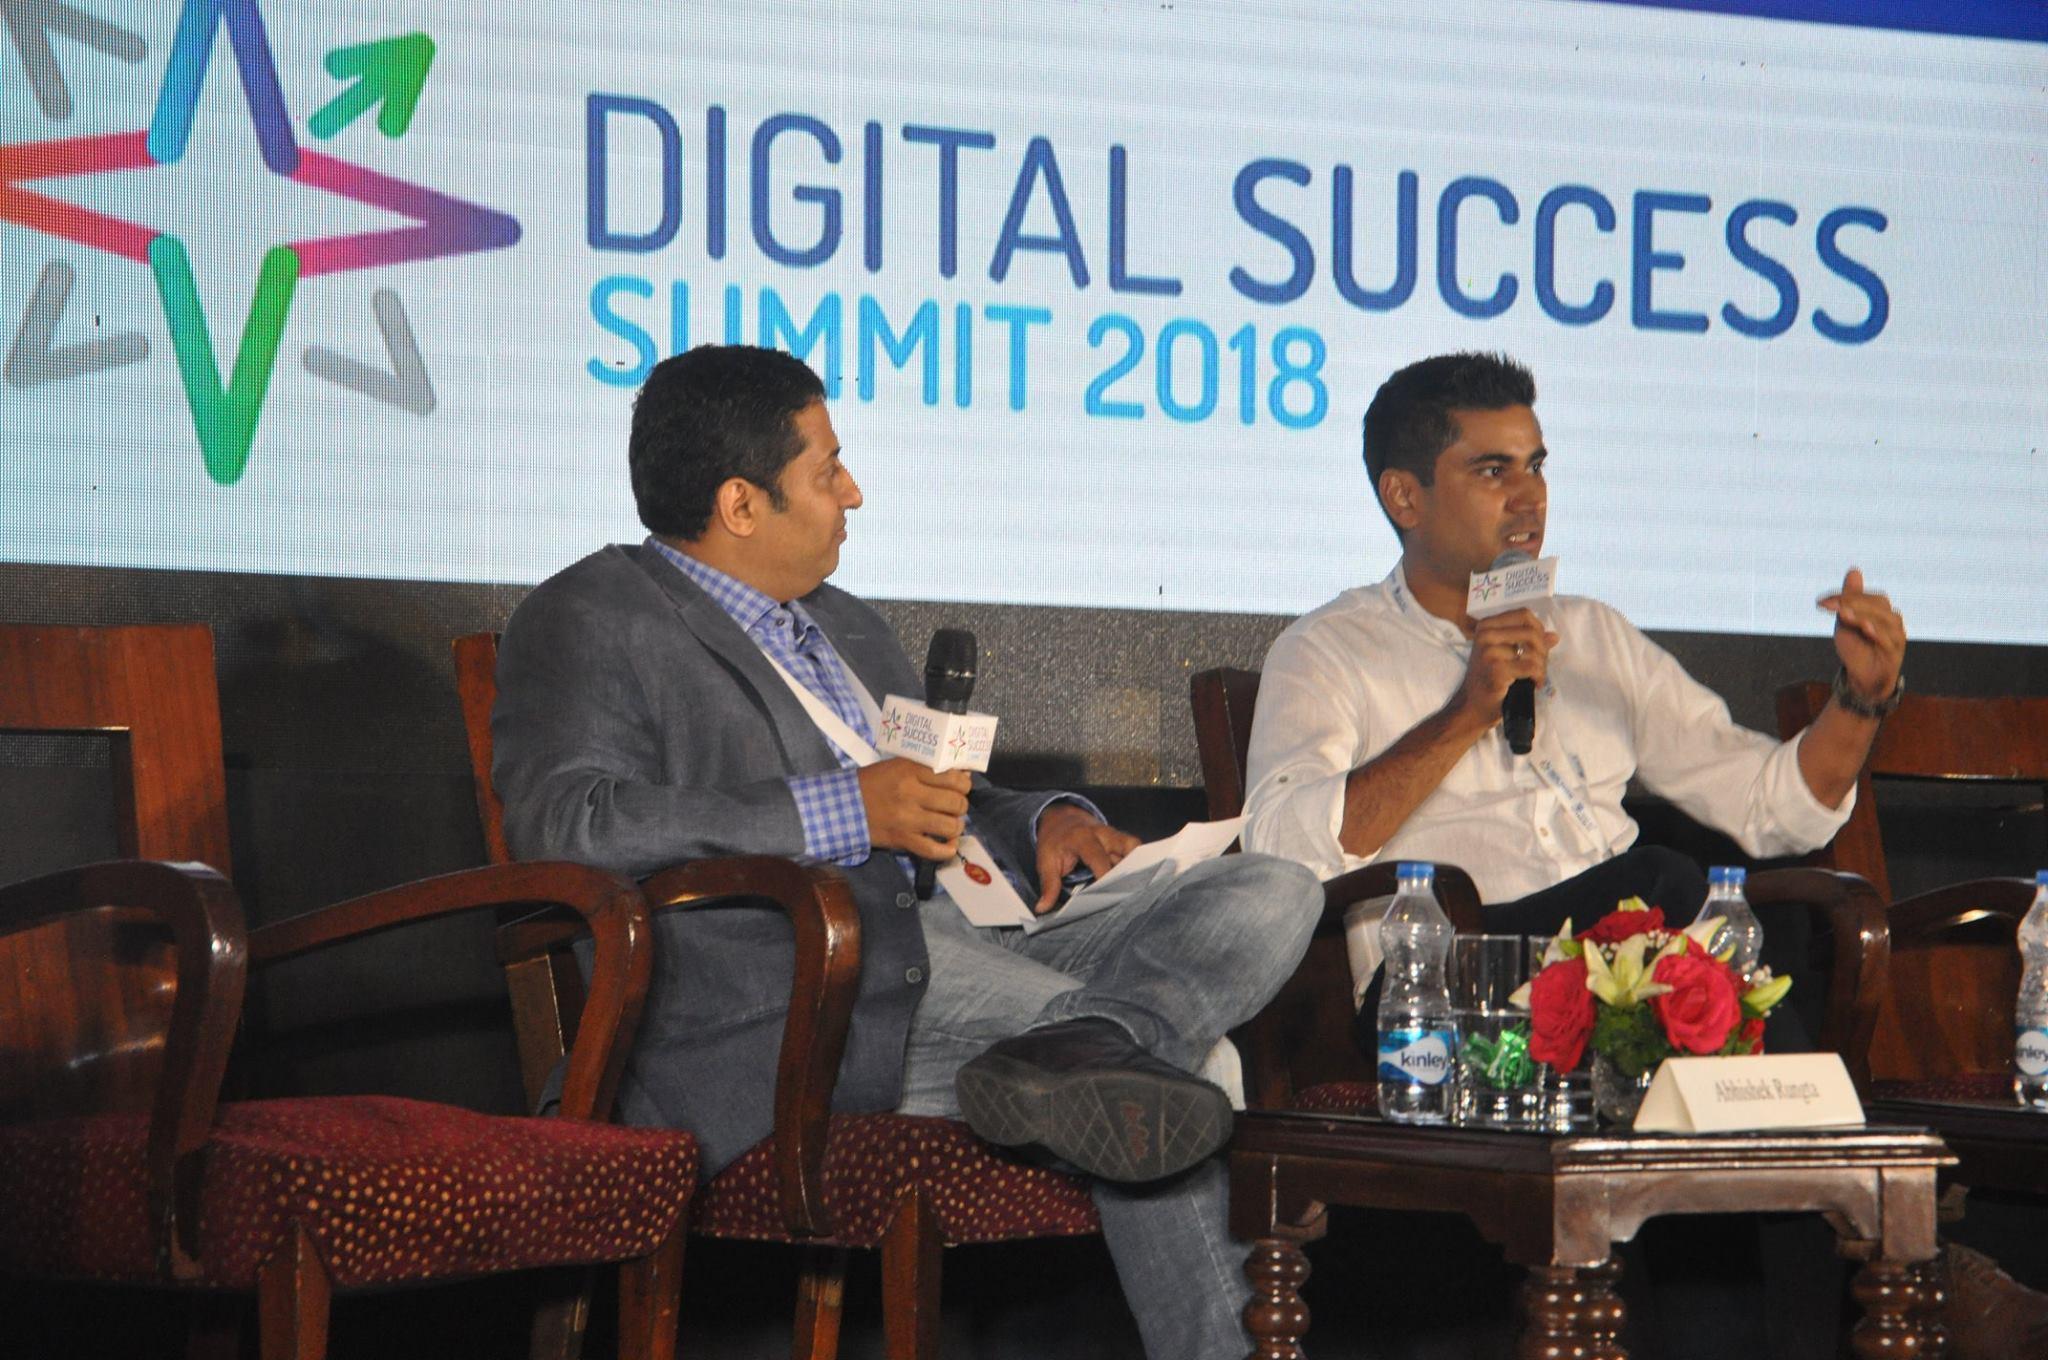 Digital Success Summit 2018